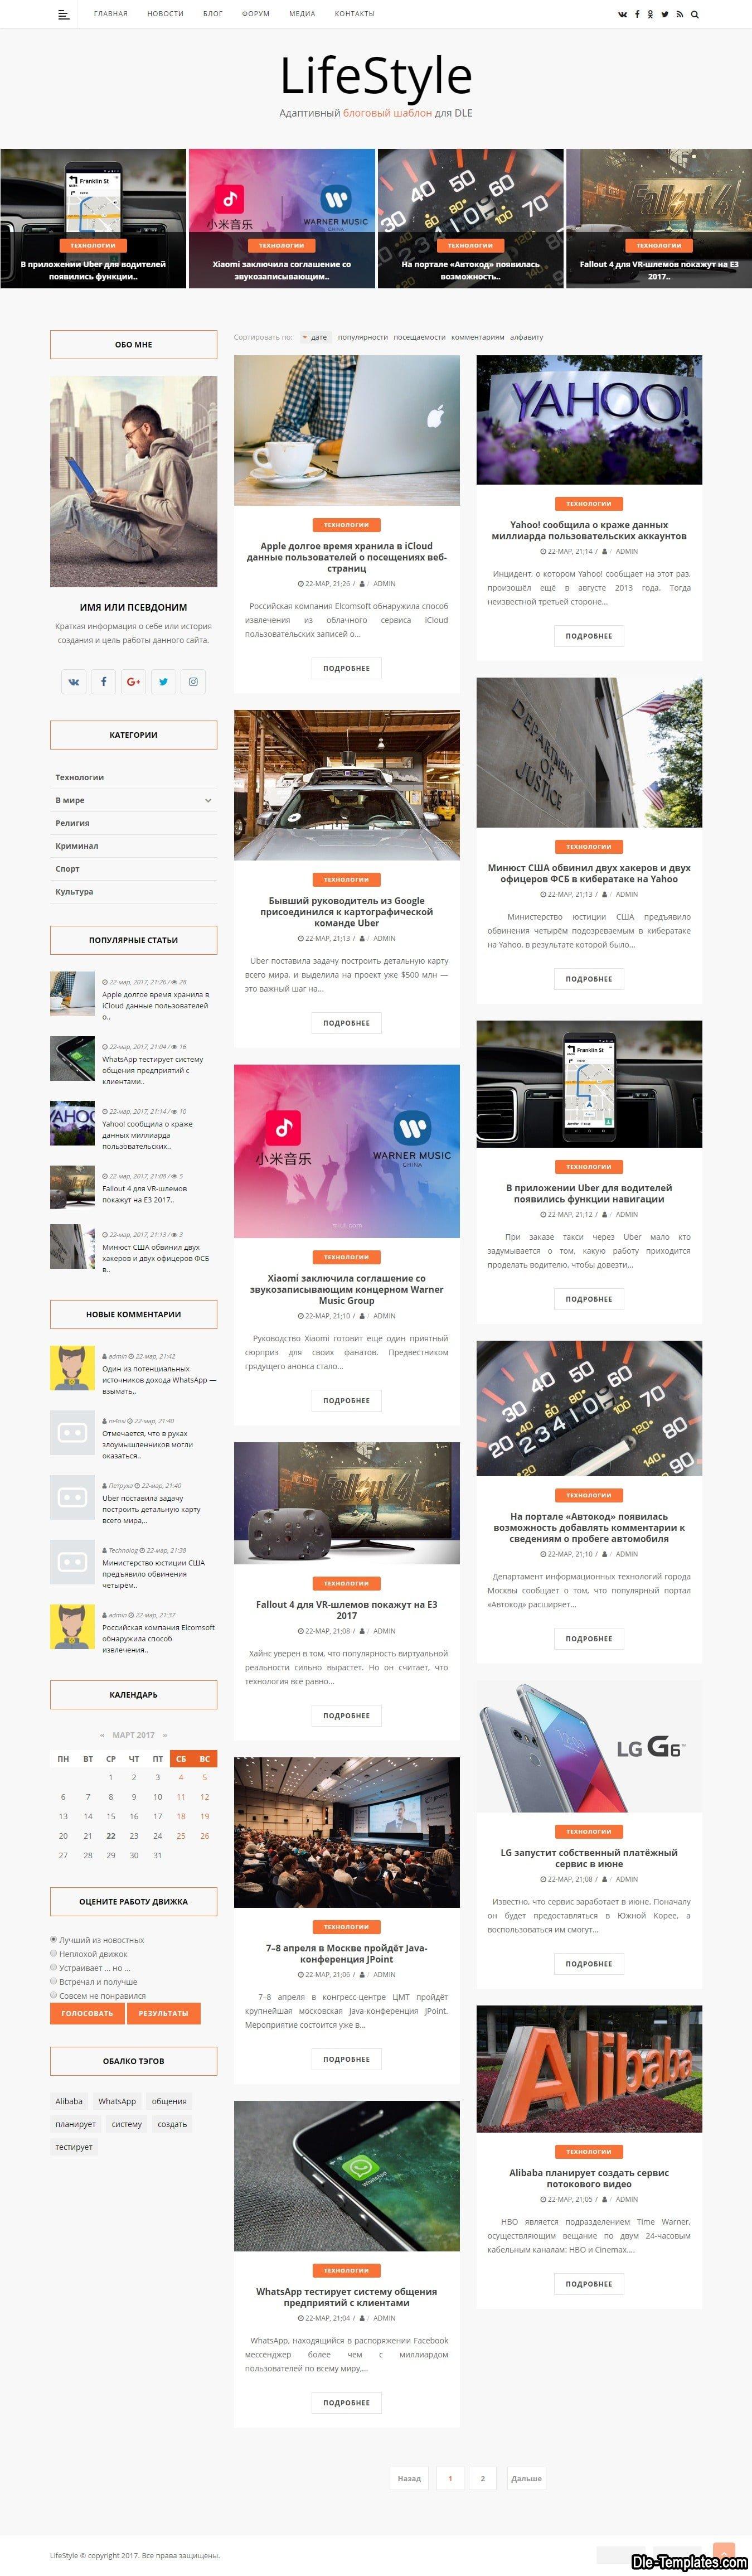 LifeStyle - адаптивный блоговый шаблон для DLE